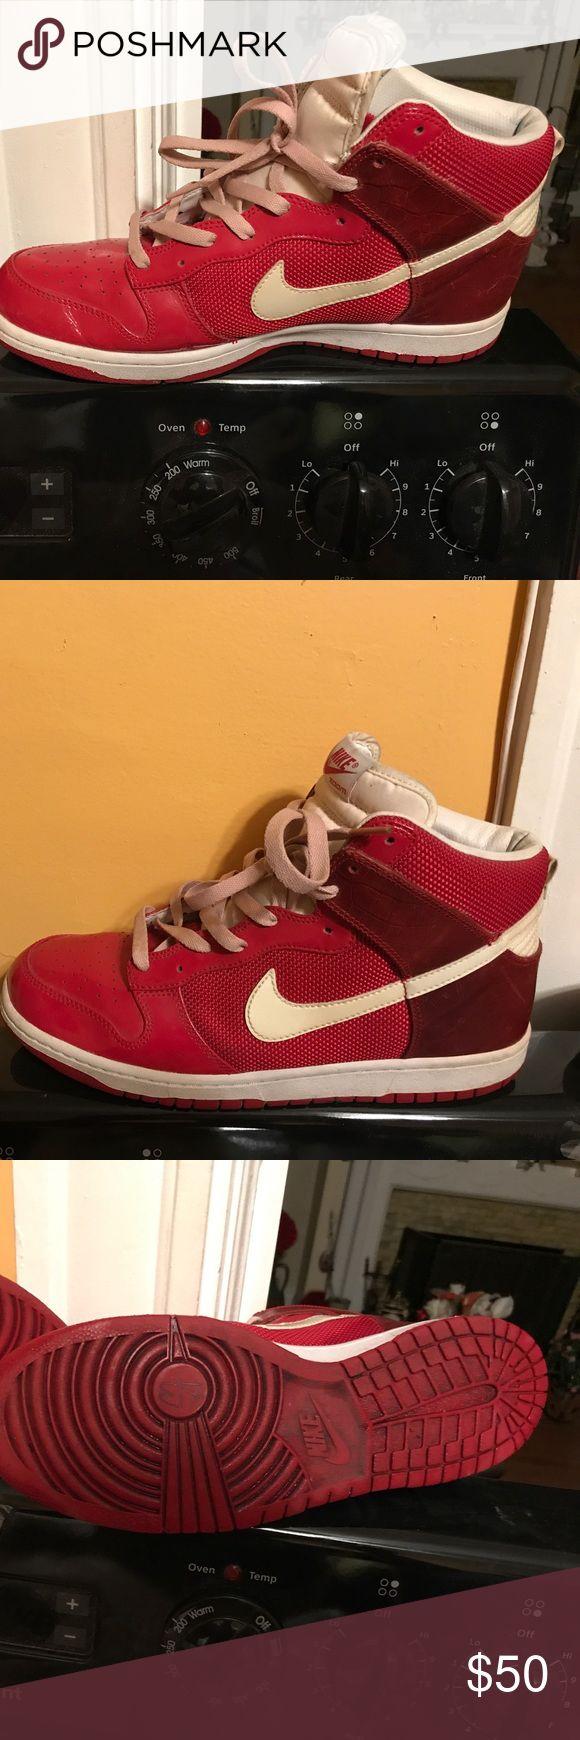 Men's Nike hi top sneaker Size 11 red men's hi top Nike sneaker. Worn once.  Red sneaker w/ white Nike symbol. Nike Shoes Athletic Shoes